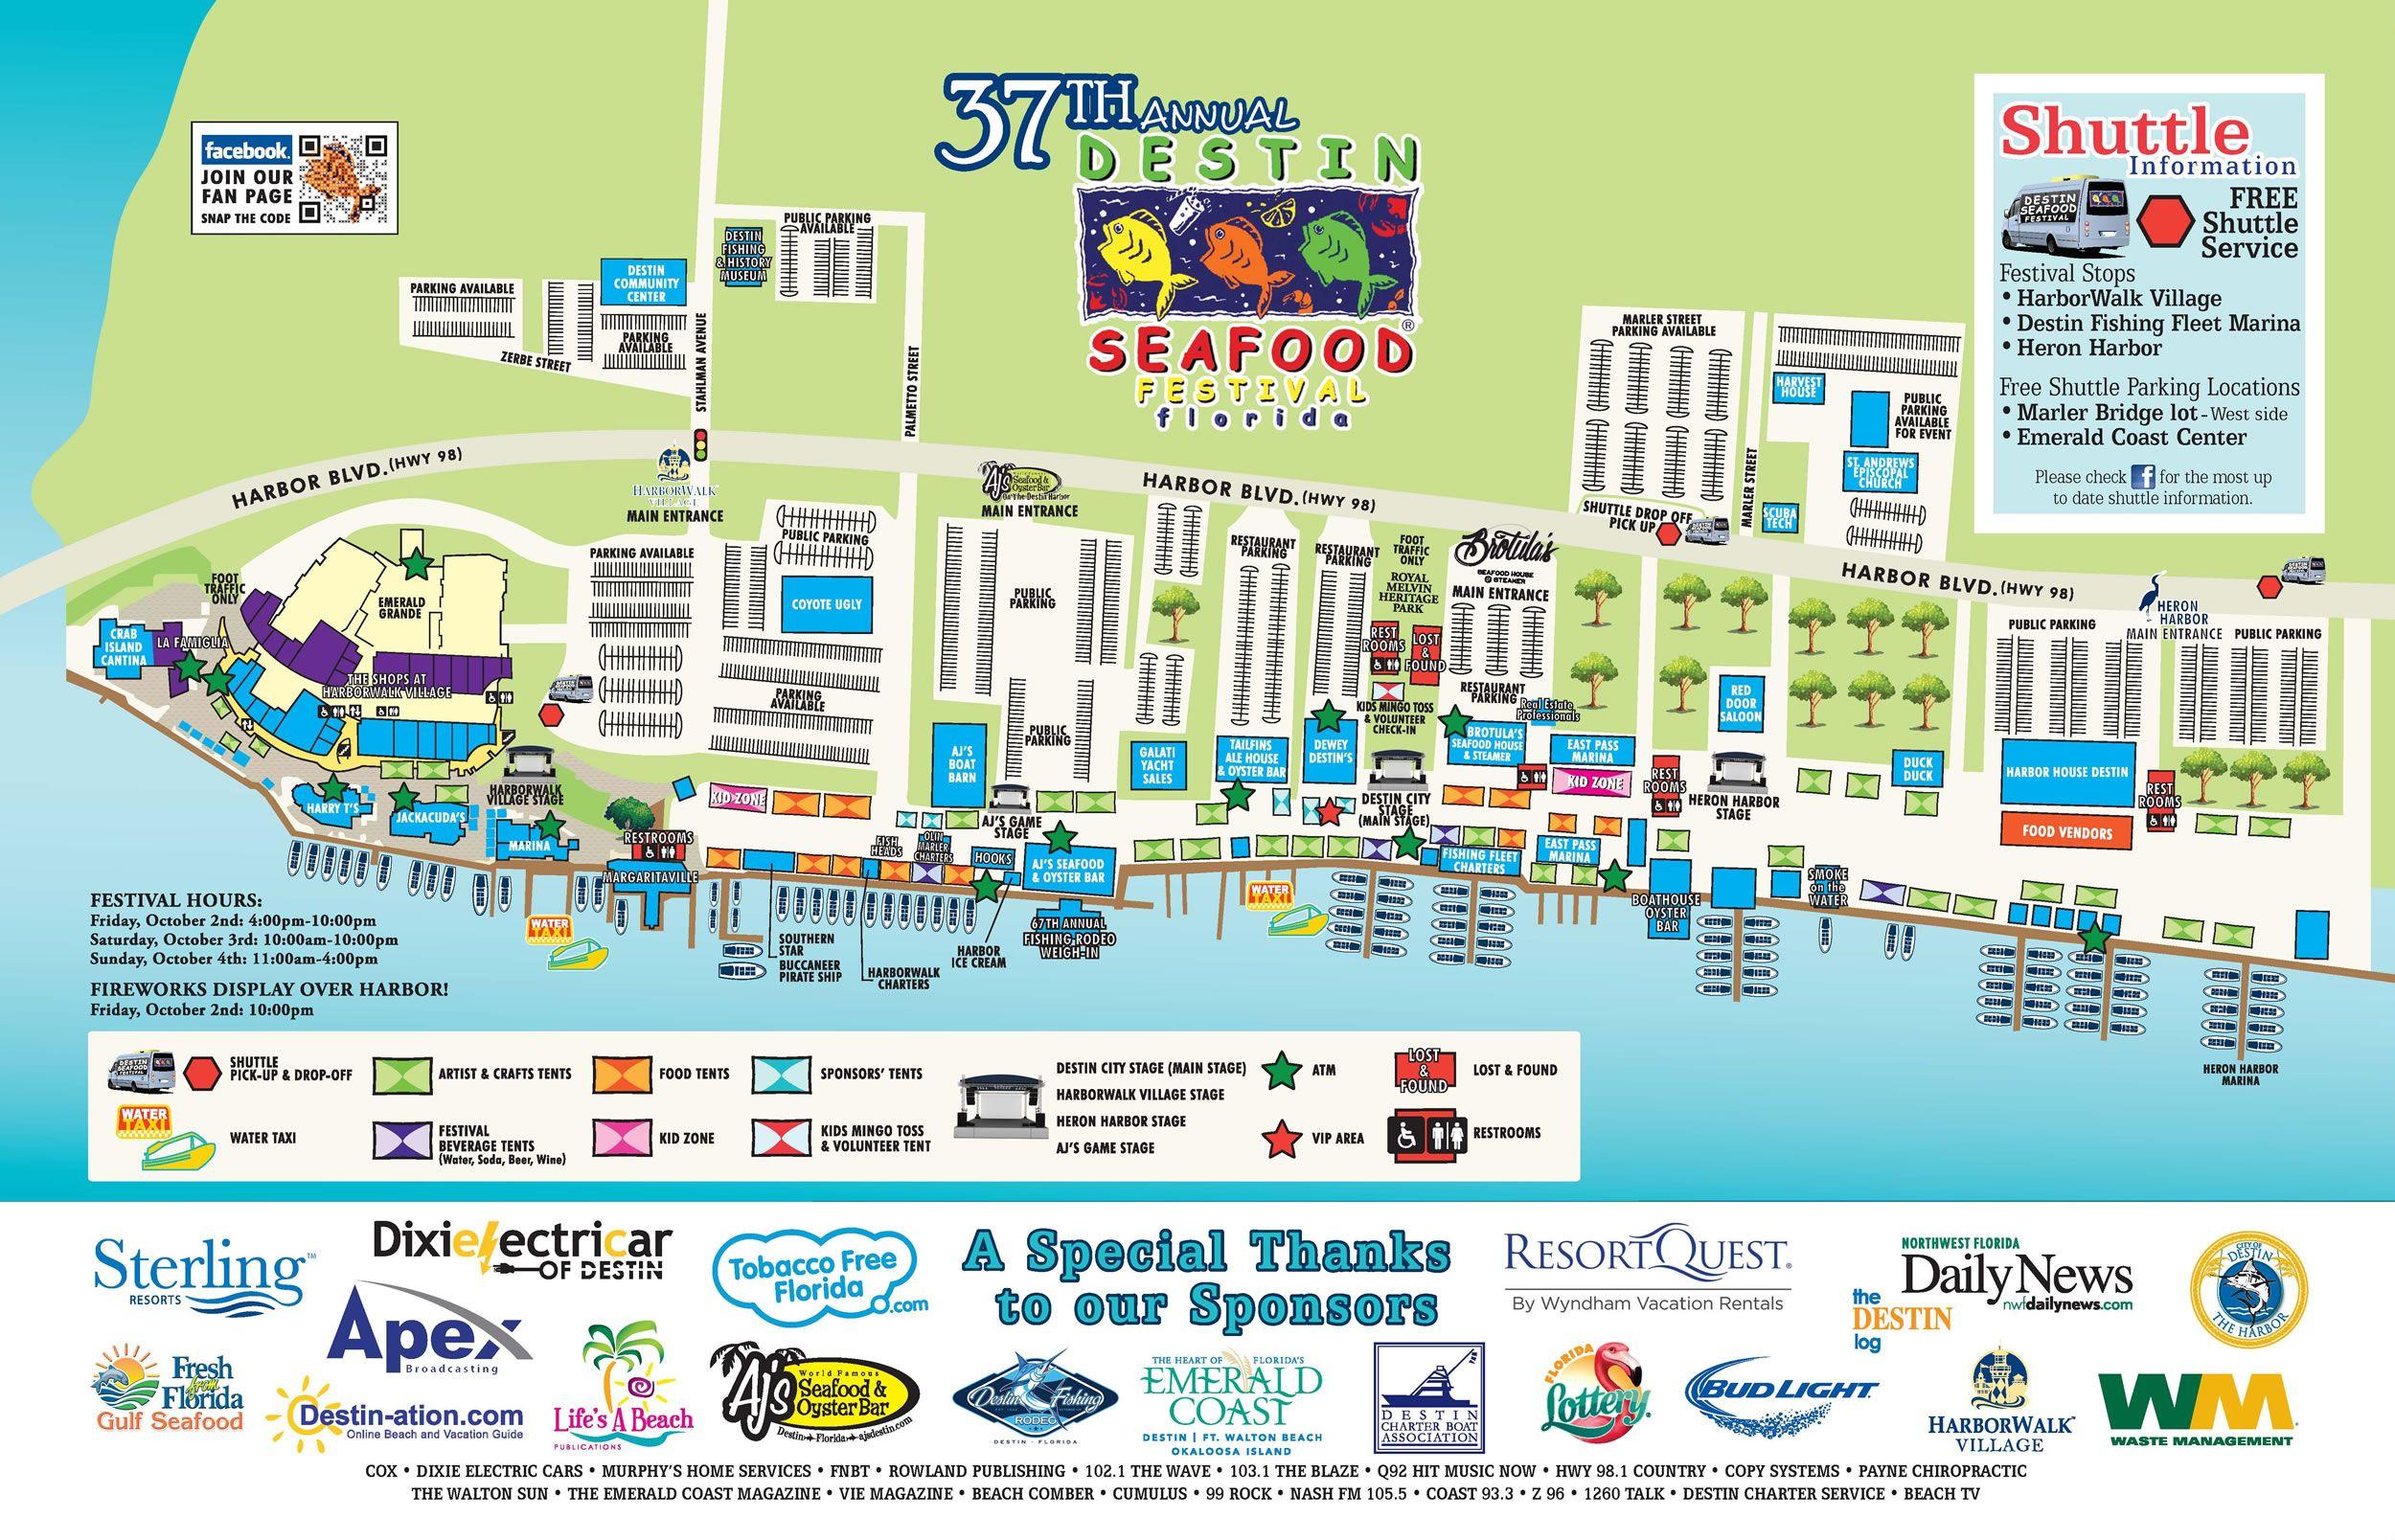 Destin Florida Map   Travel   Pinterest   Destin Florida, Florida - Map Of Destin Florida Attractions